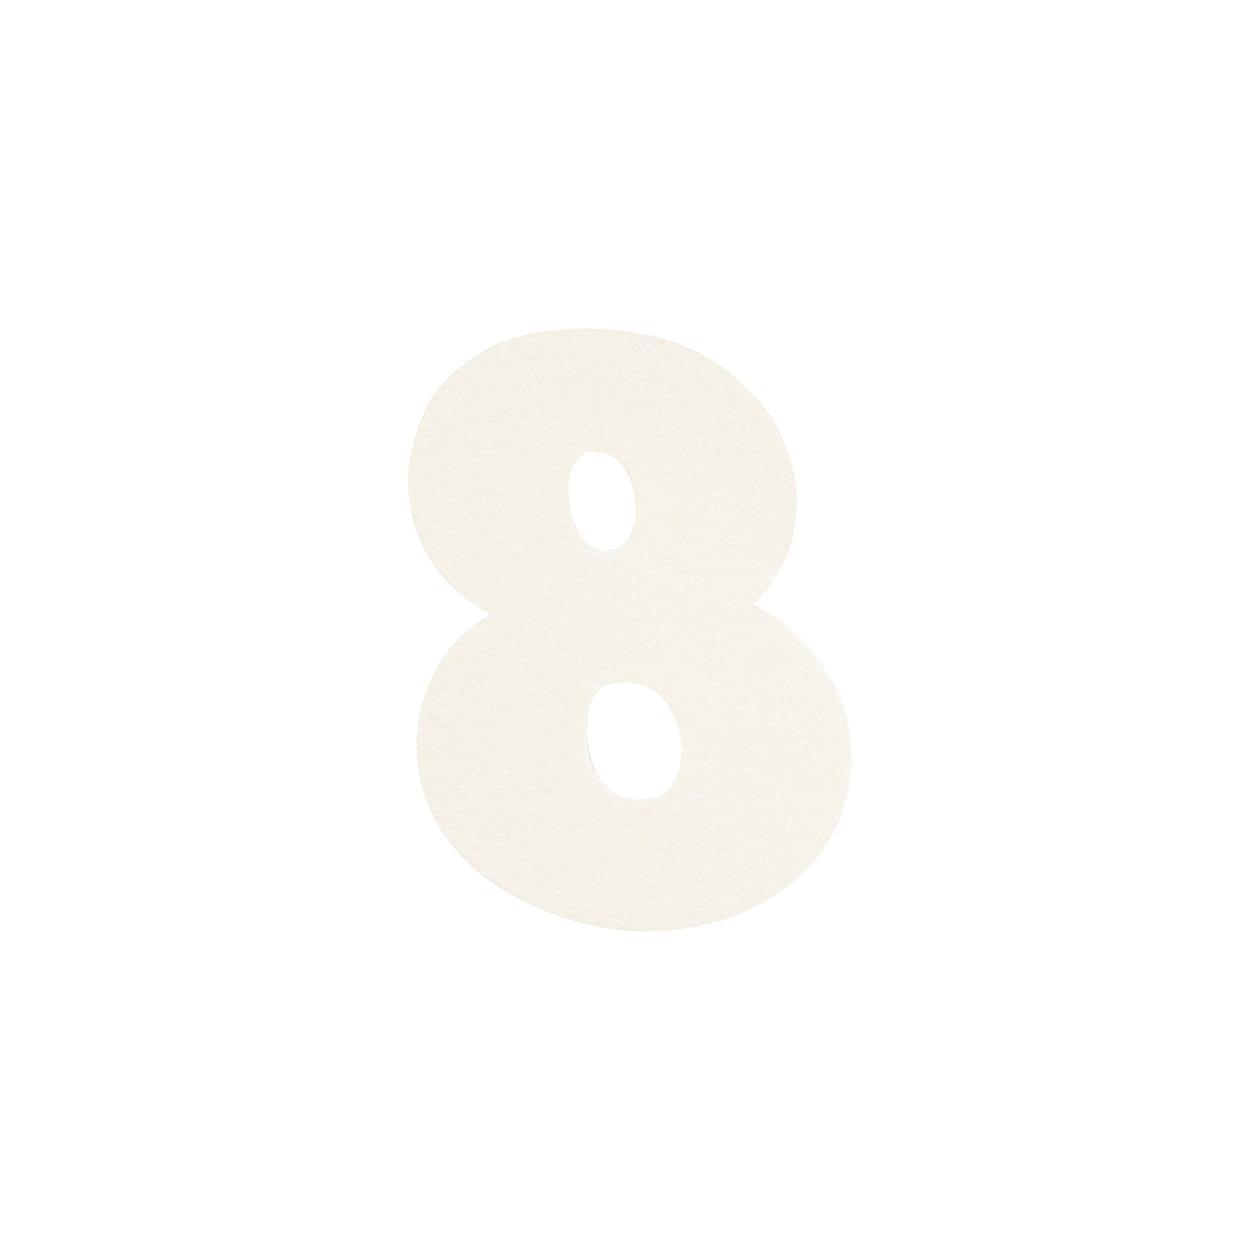 No.395ボード ネームカードDC 数字8 シルバー